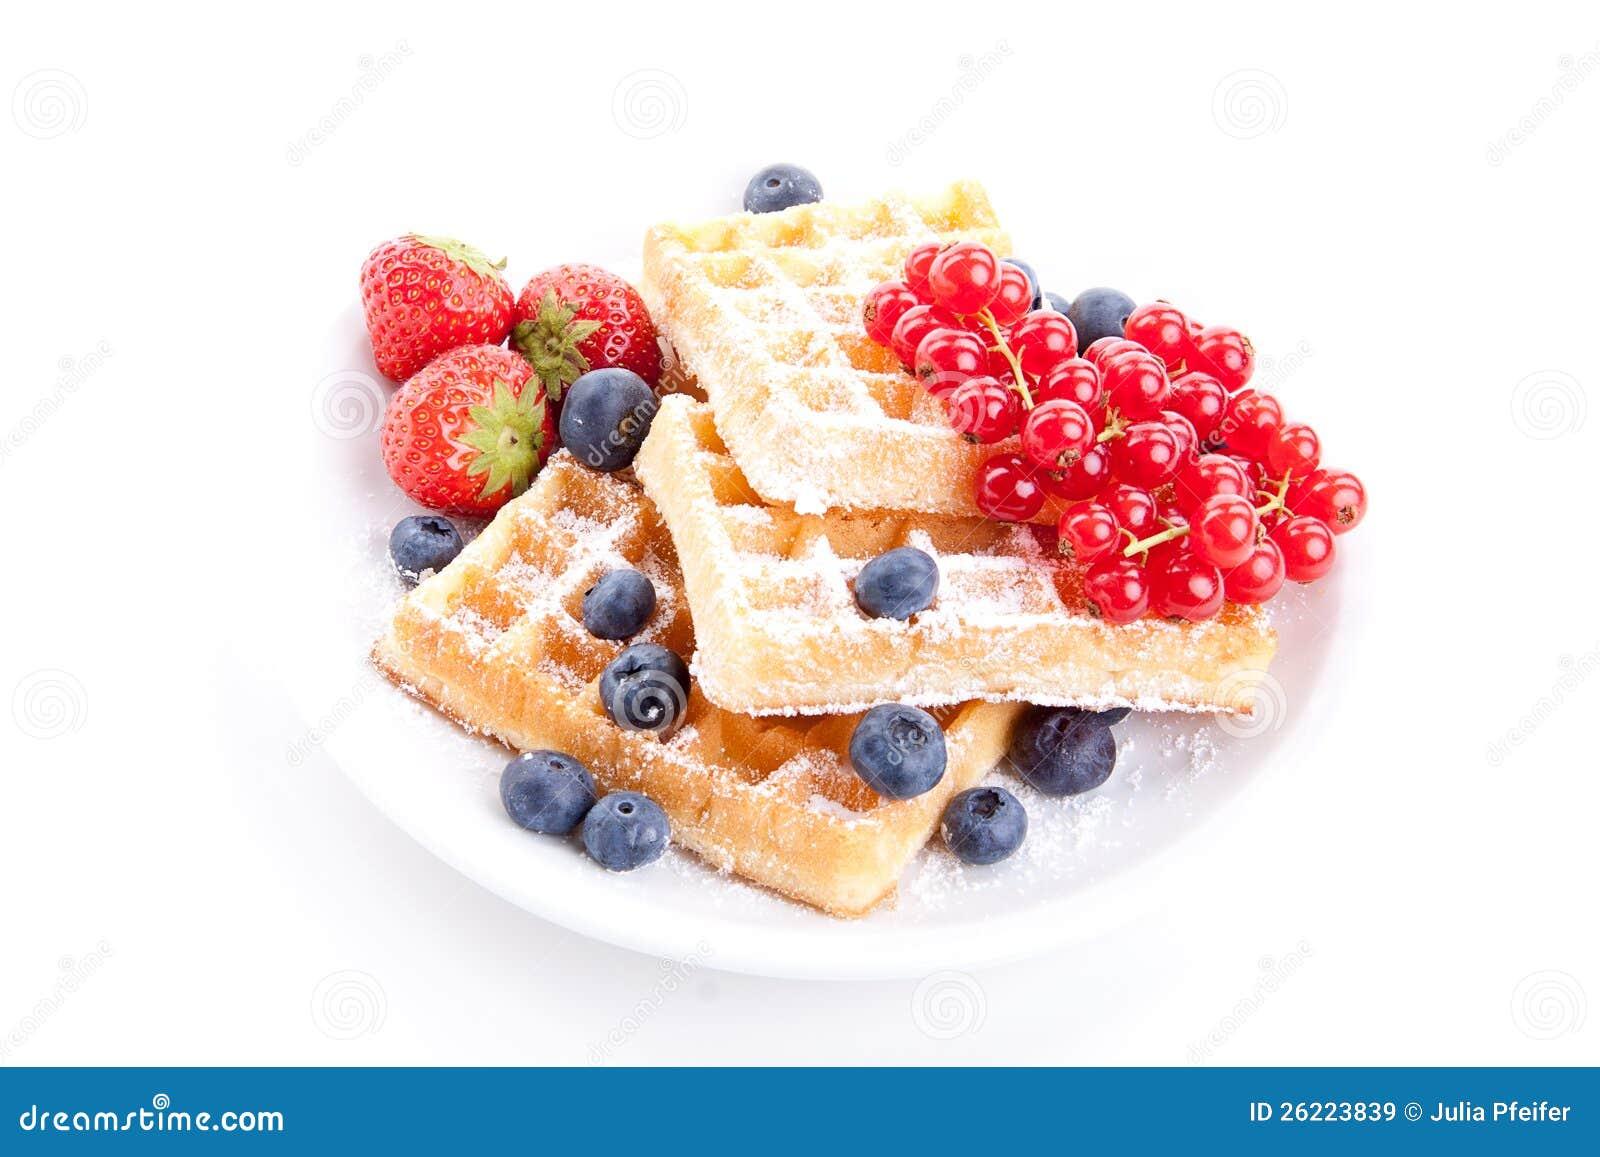 Sweet fresh tasty waffles with mixed fruits